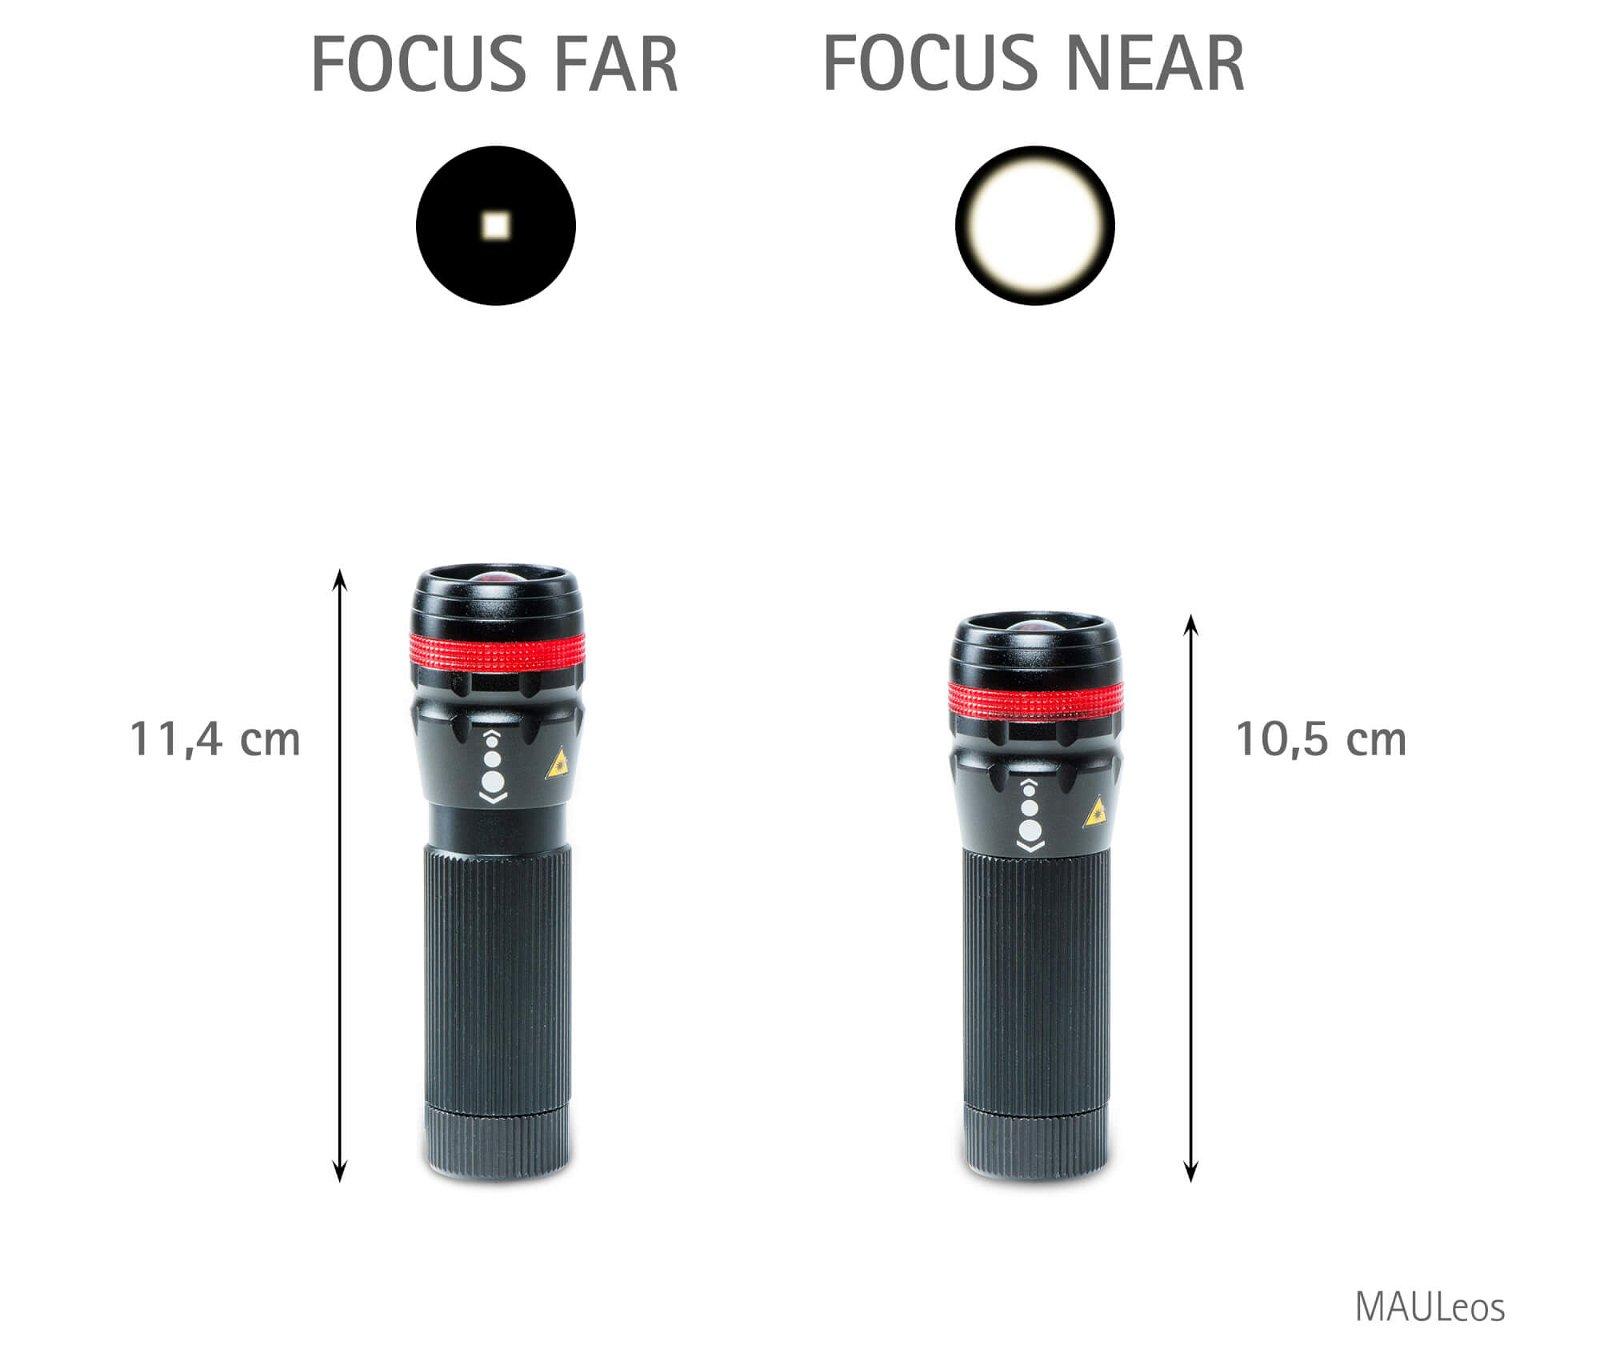 LED-Taschenlampe MAULeos Zoom